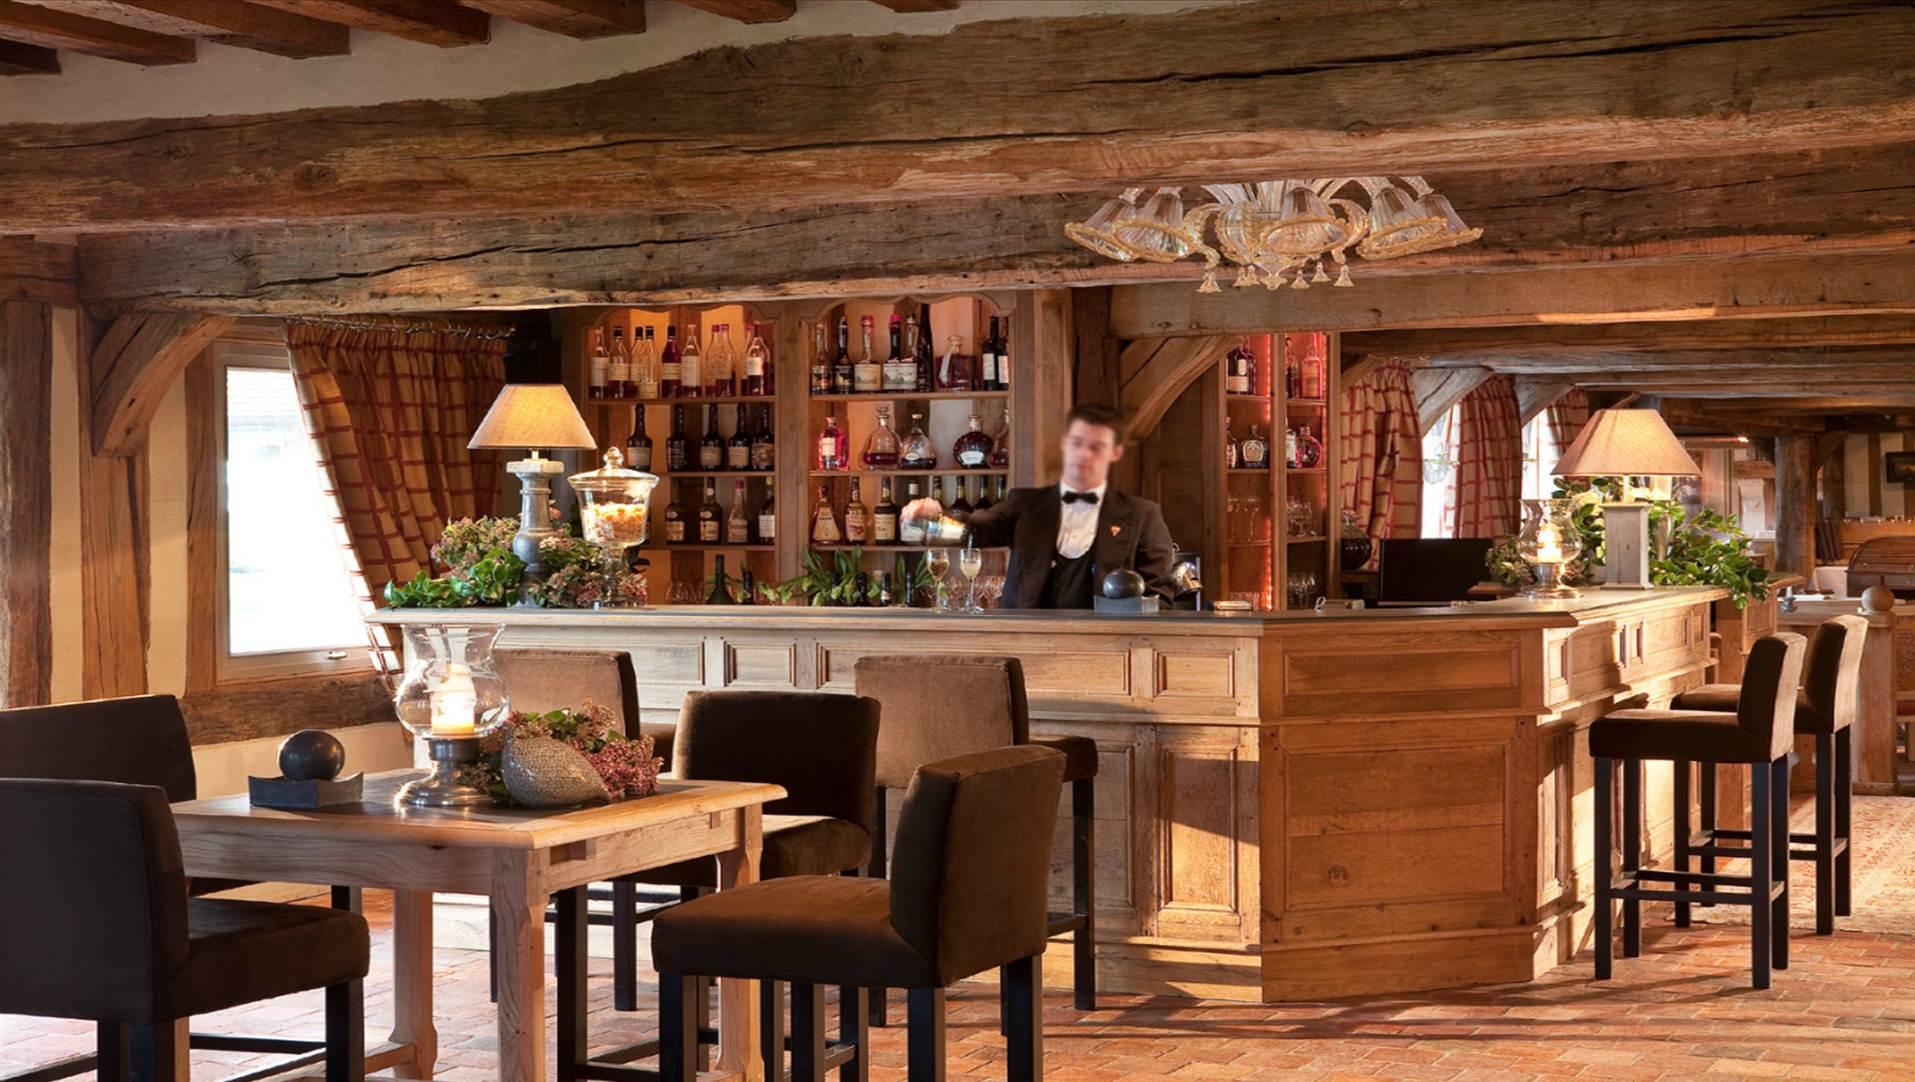 ferme-saint-simeon-hotel-veronese-3